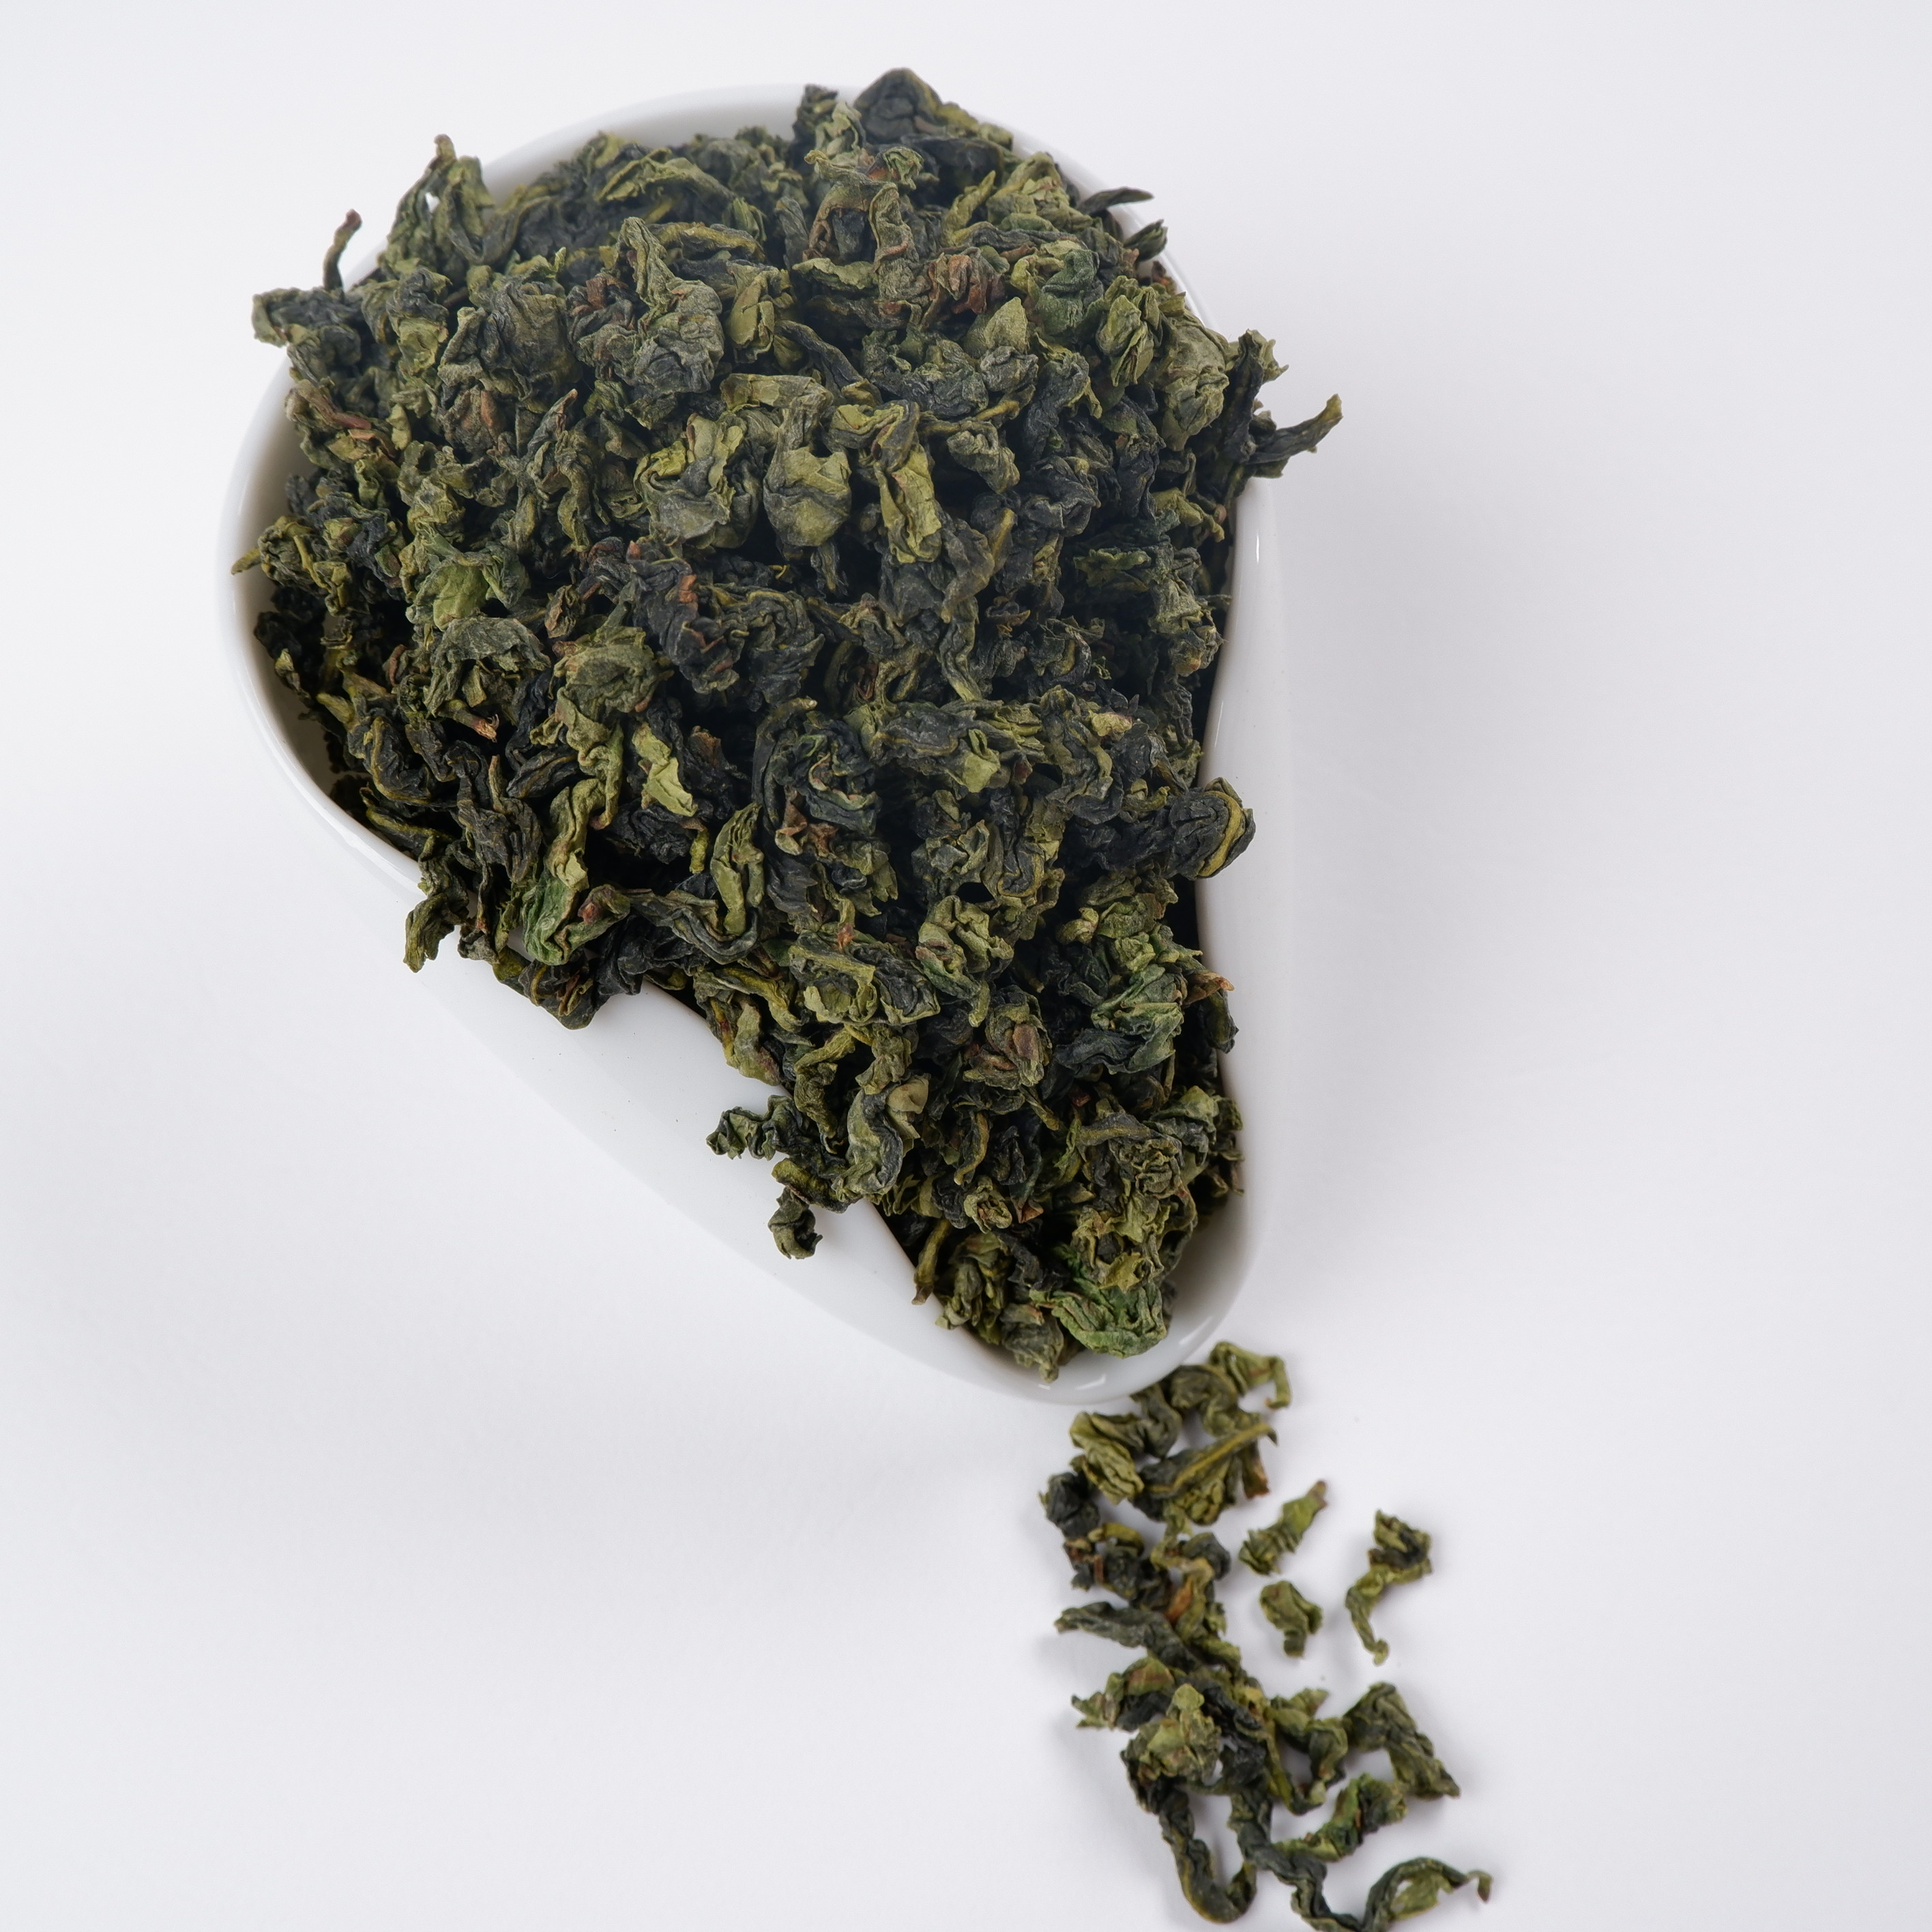 Fujian Natural Superfine Quality Tie Guan Yin Oolong tea Model TGY01 - 4uTea | 4uTea.com